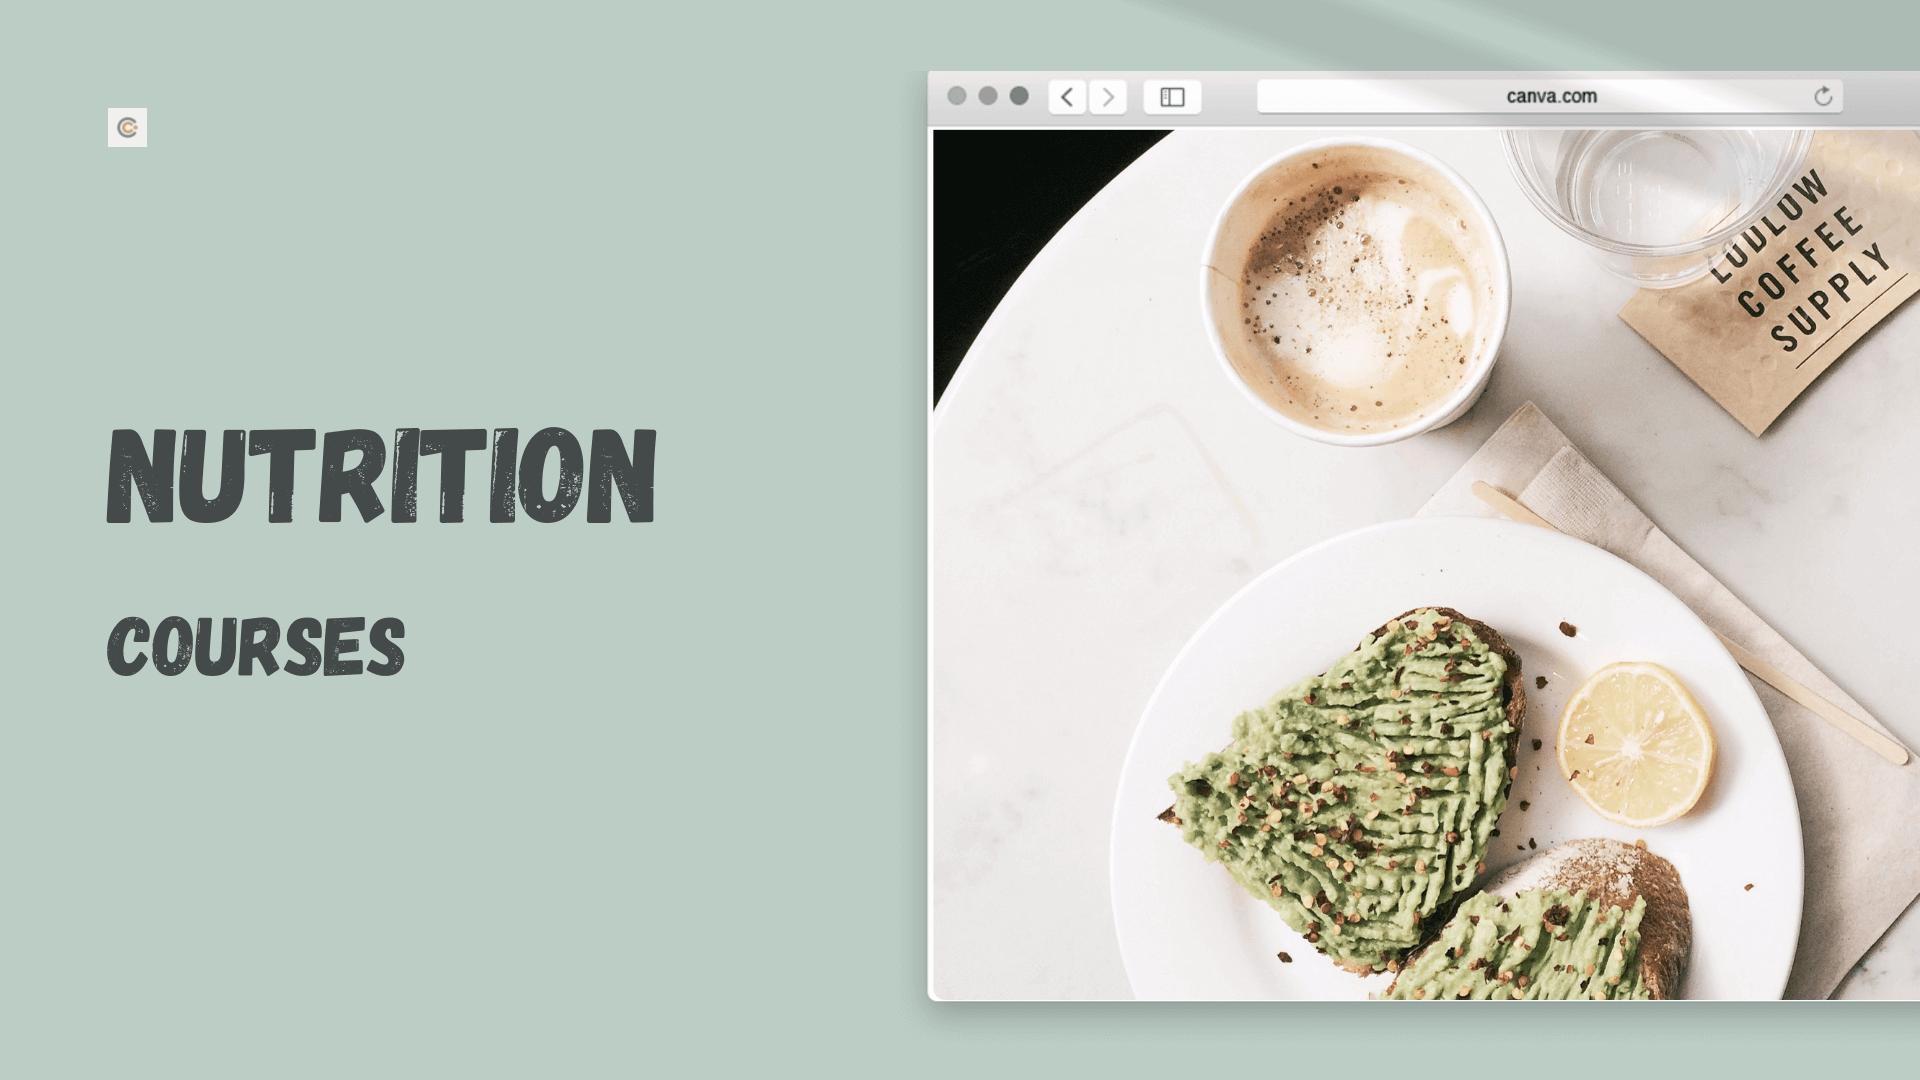 9 Best Nutrition Courses - Learn Nutrition Online